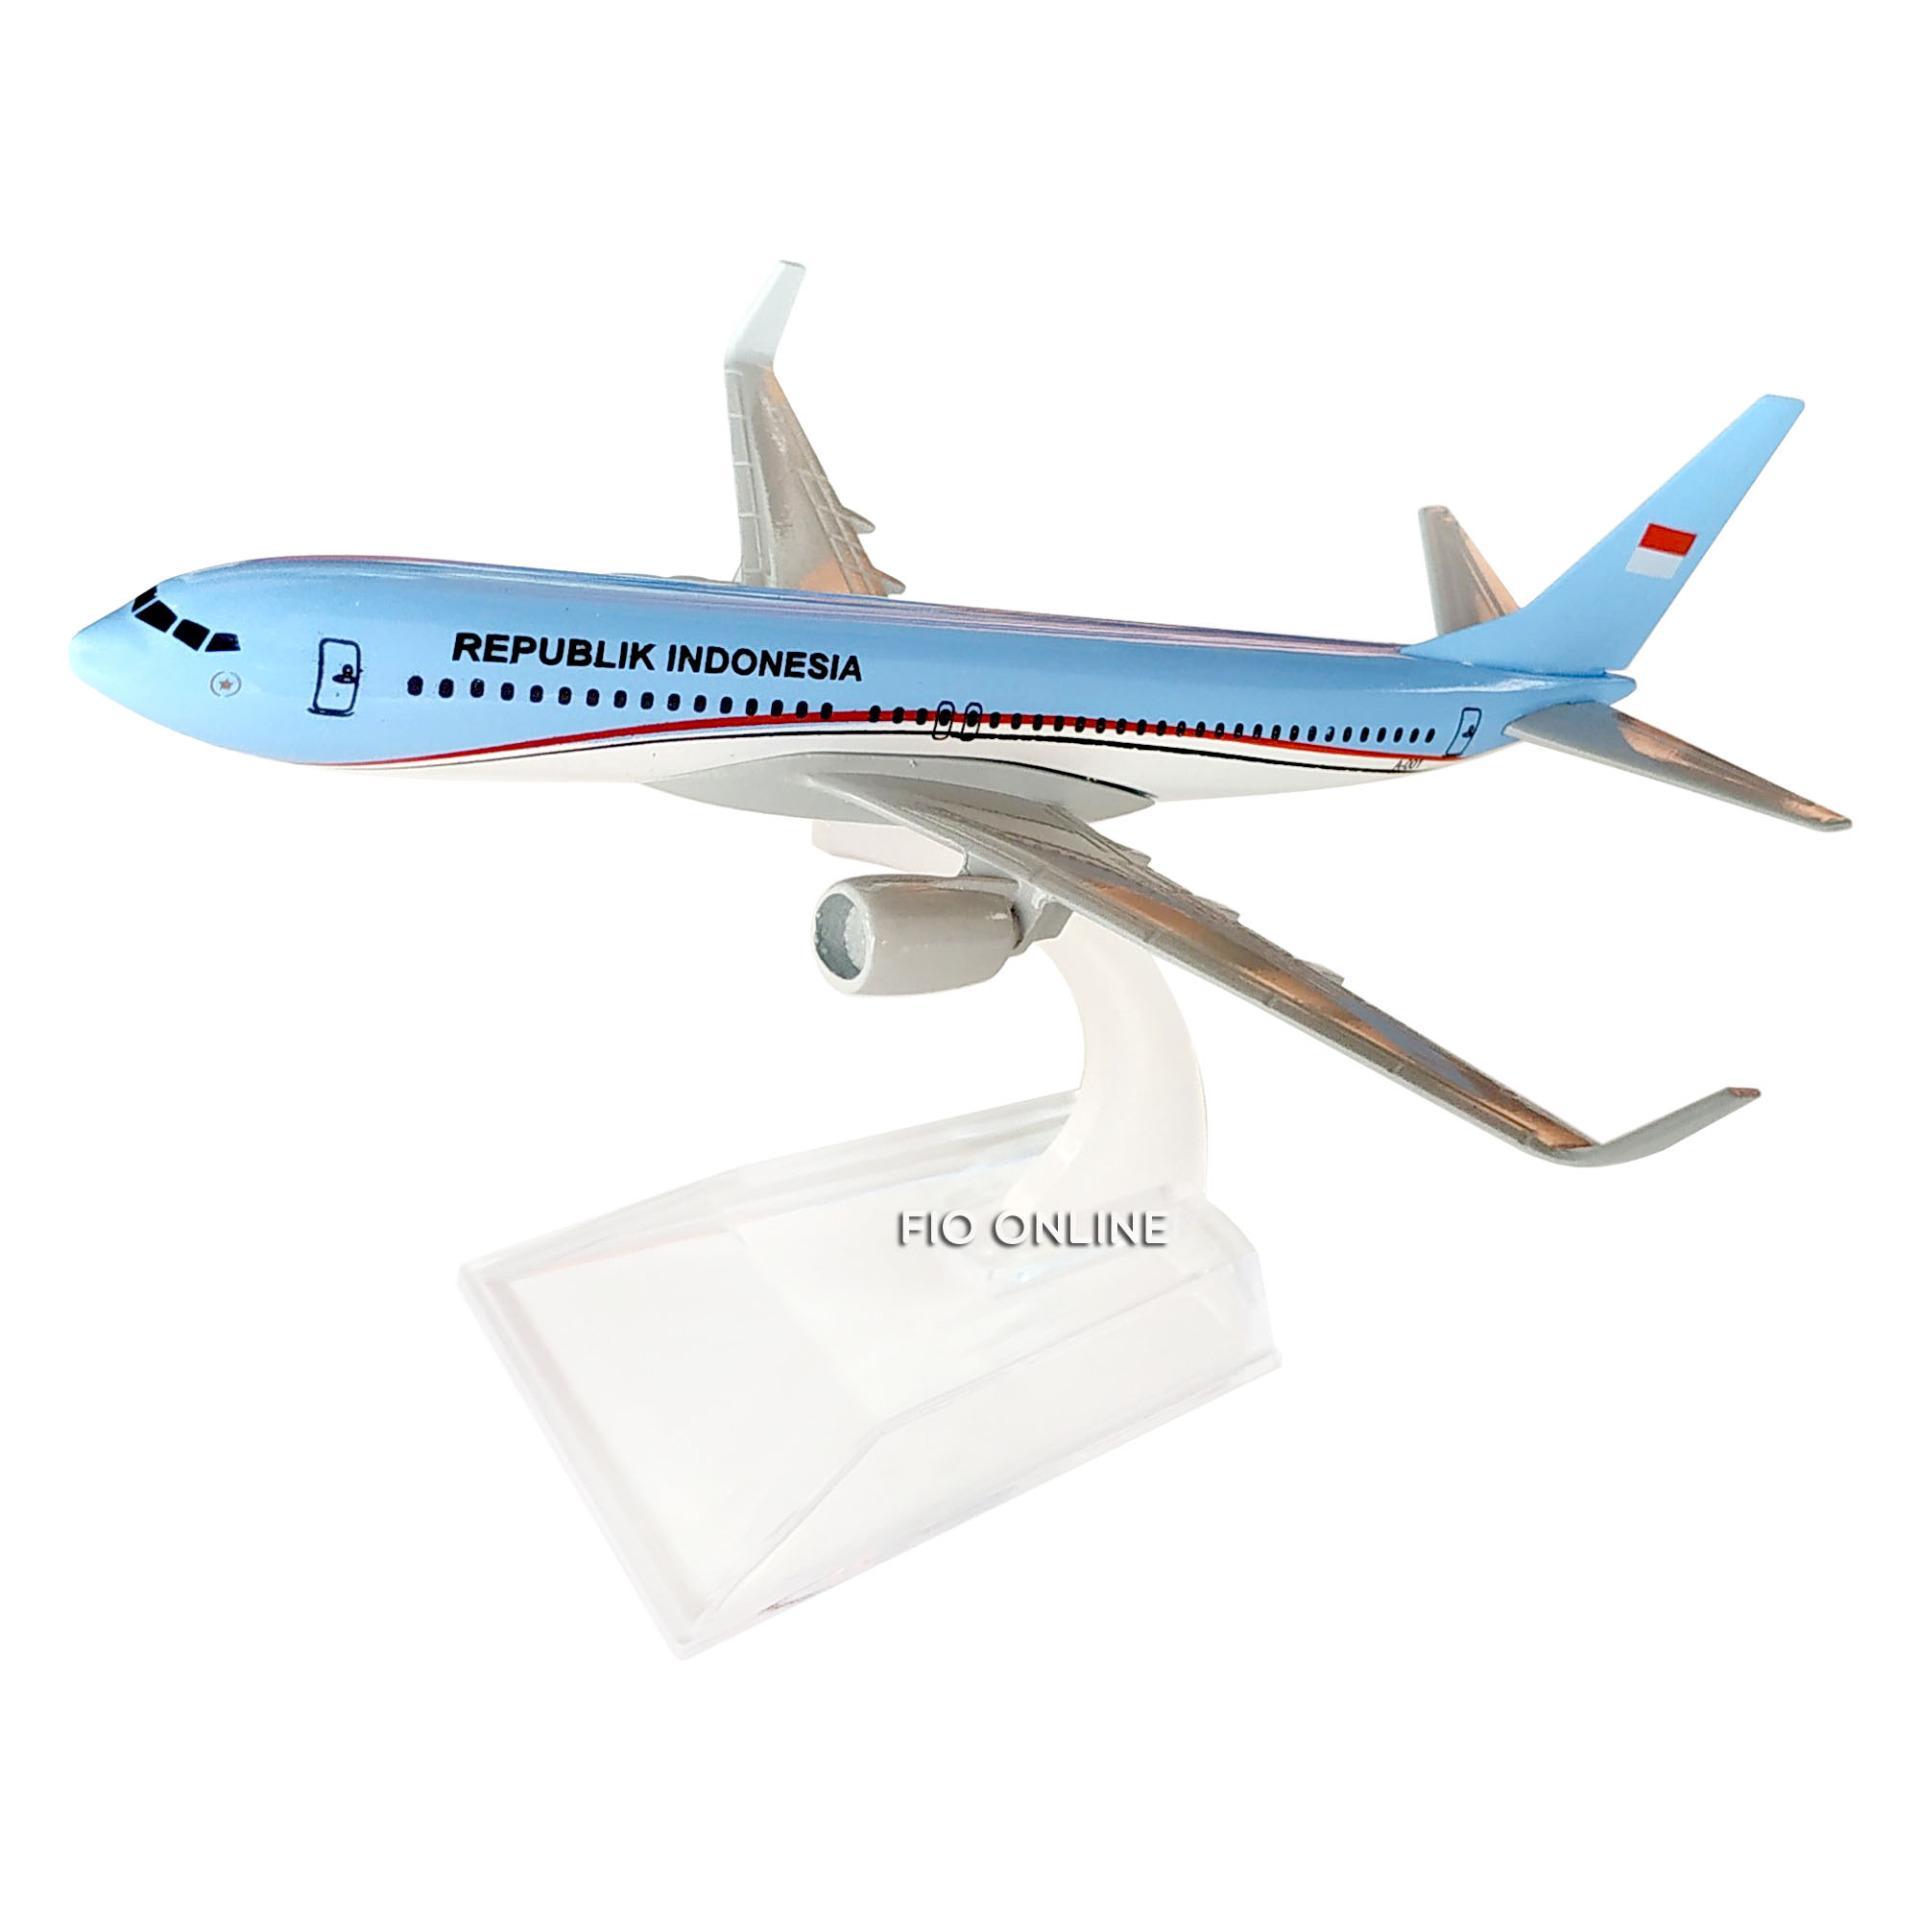 Koleksi Harga Miniatur Pesawat November 2018 Lengkap Diecast Citilink Fio Online Souvenir Model Aircraft Kepresidenan Indonesia Boeing 737 800